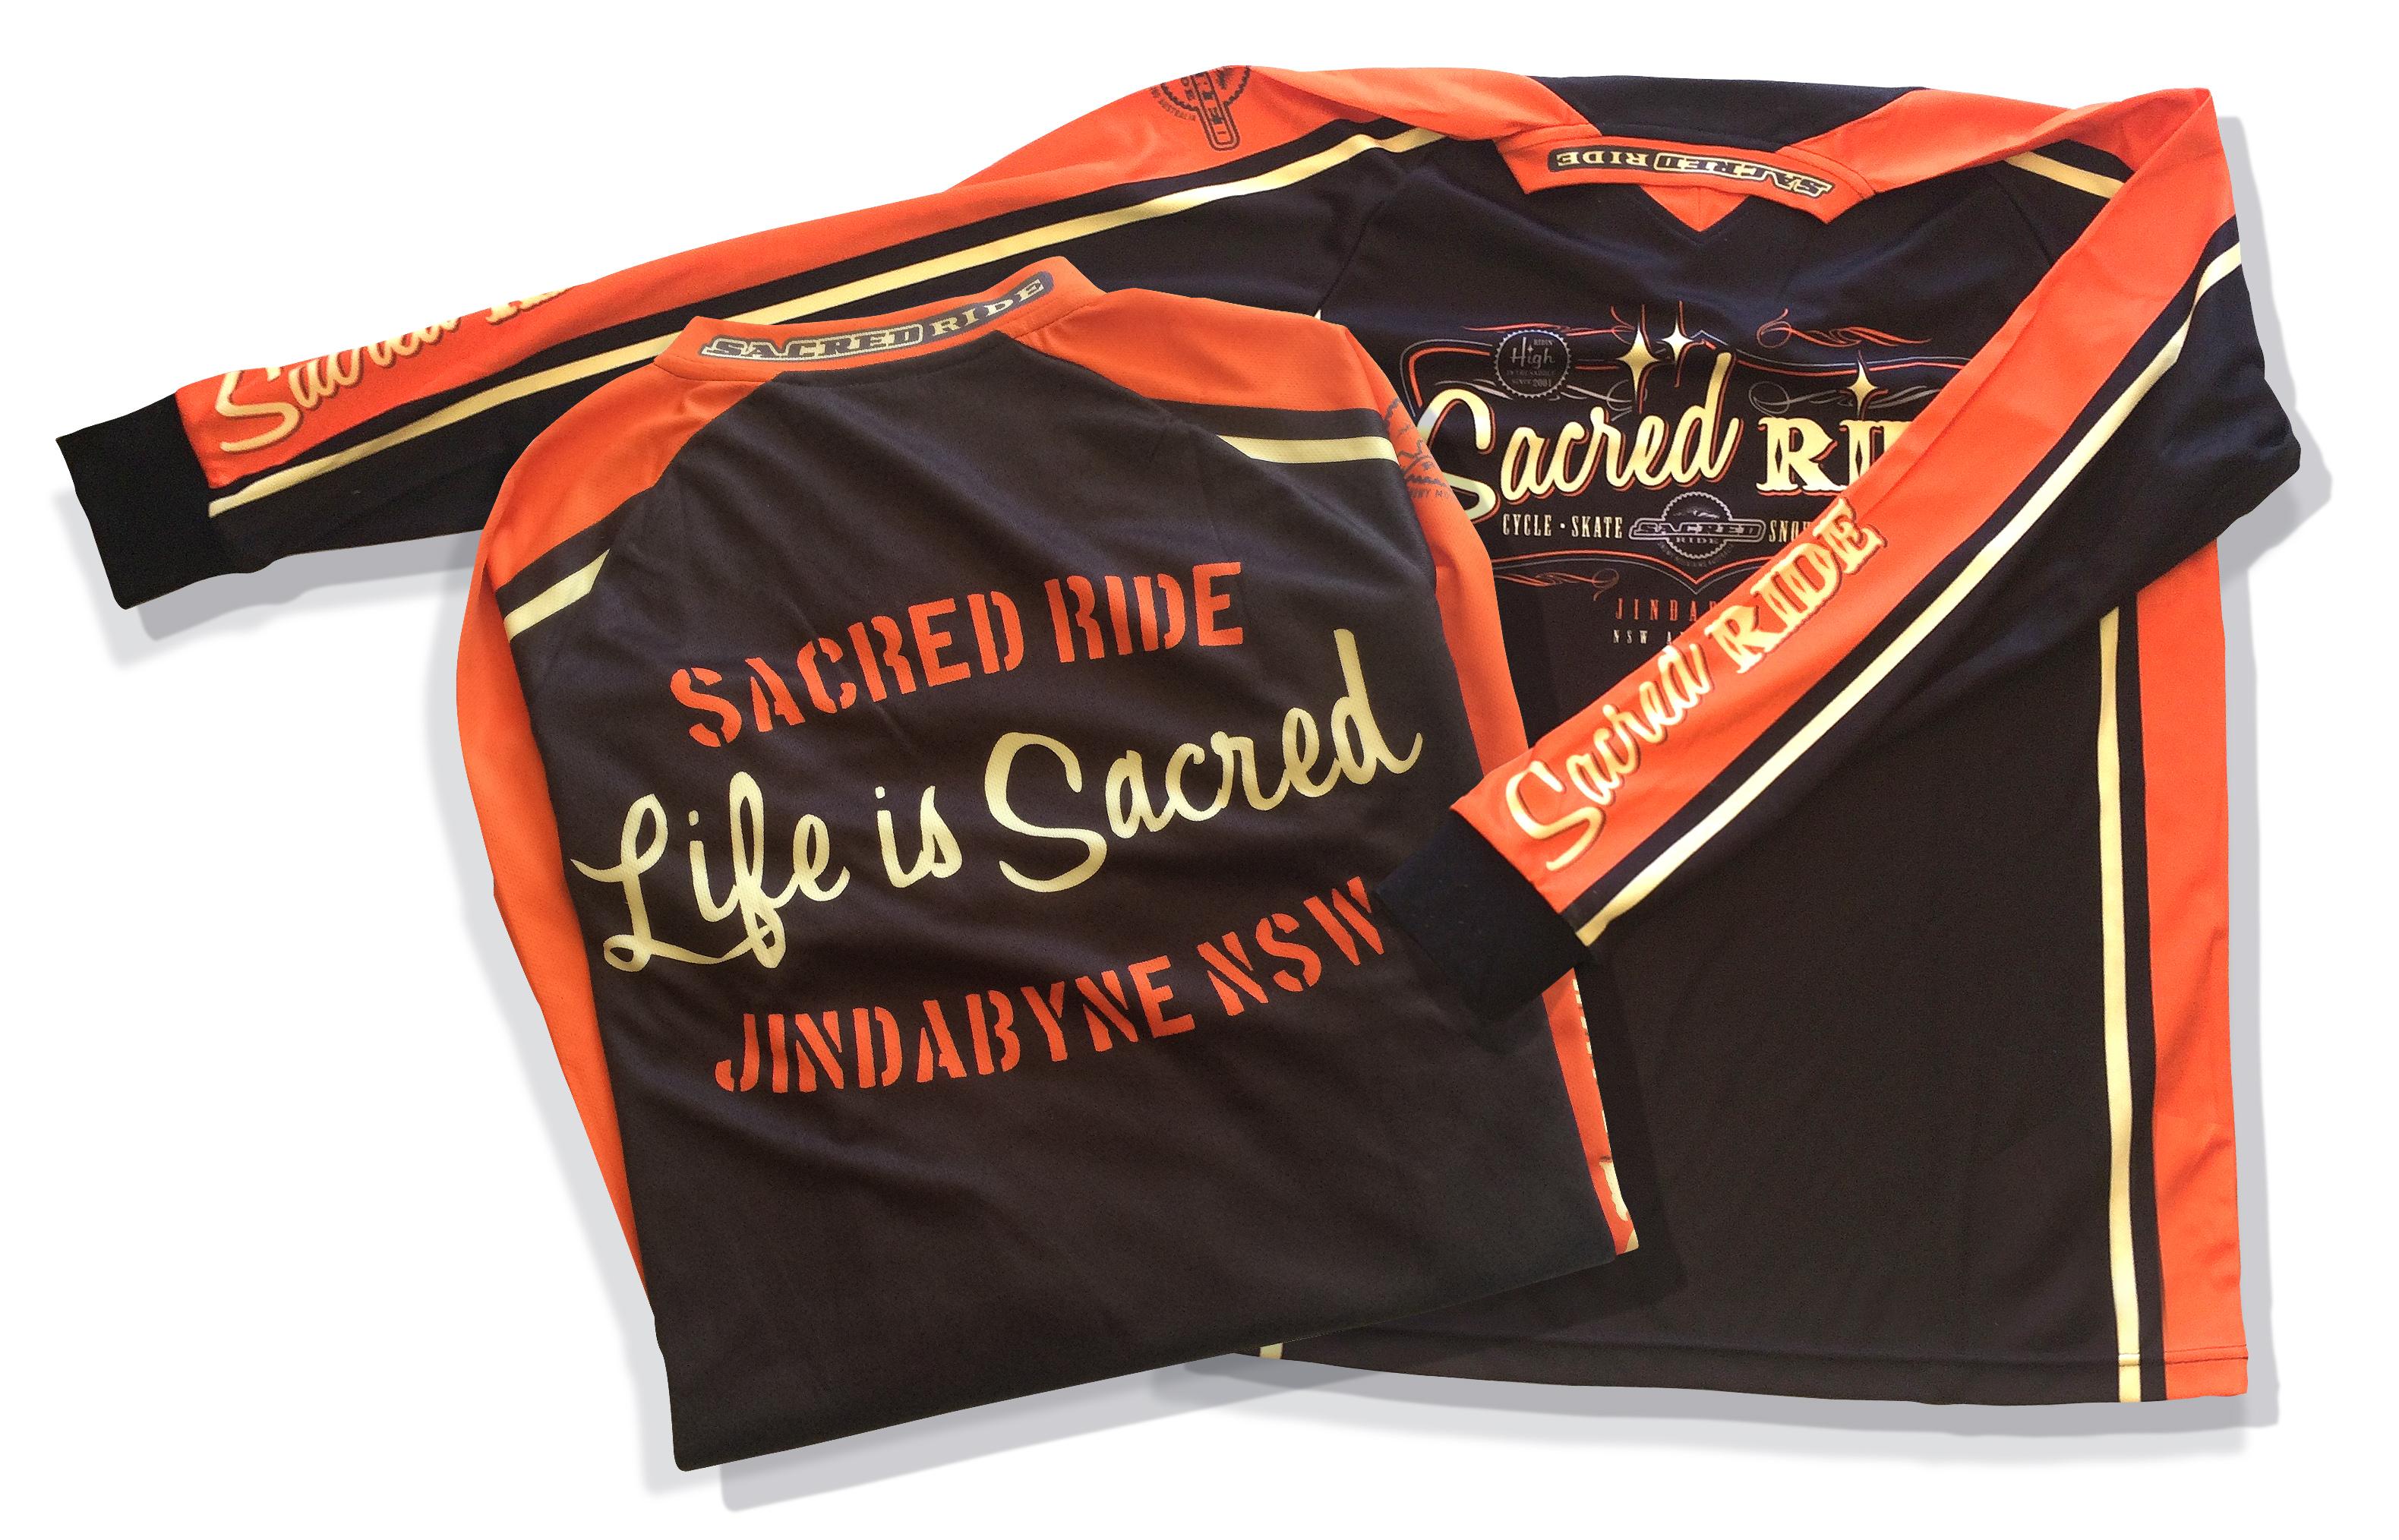 Sacred_mtb_jersey_layered